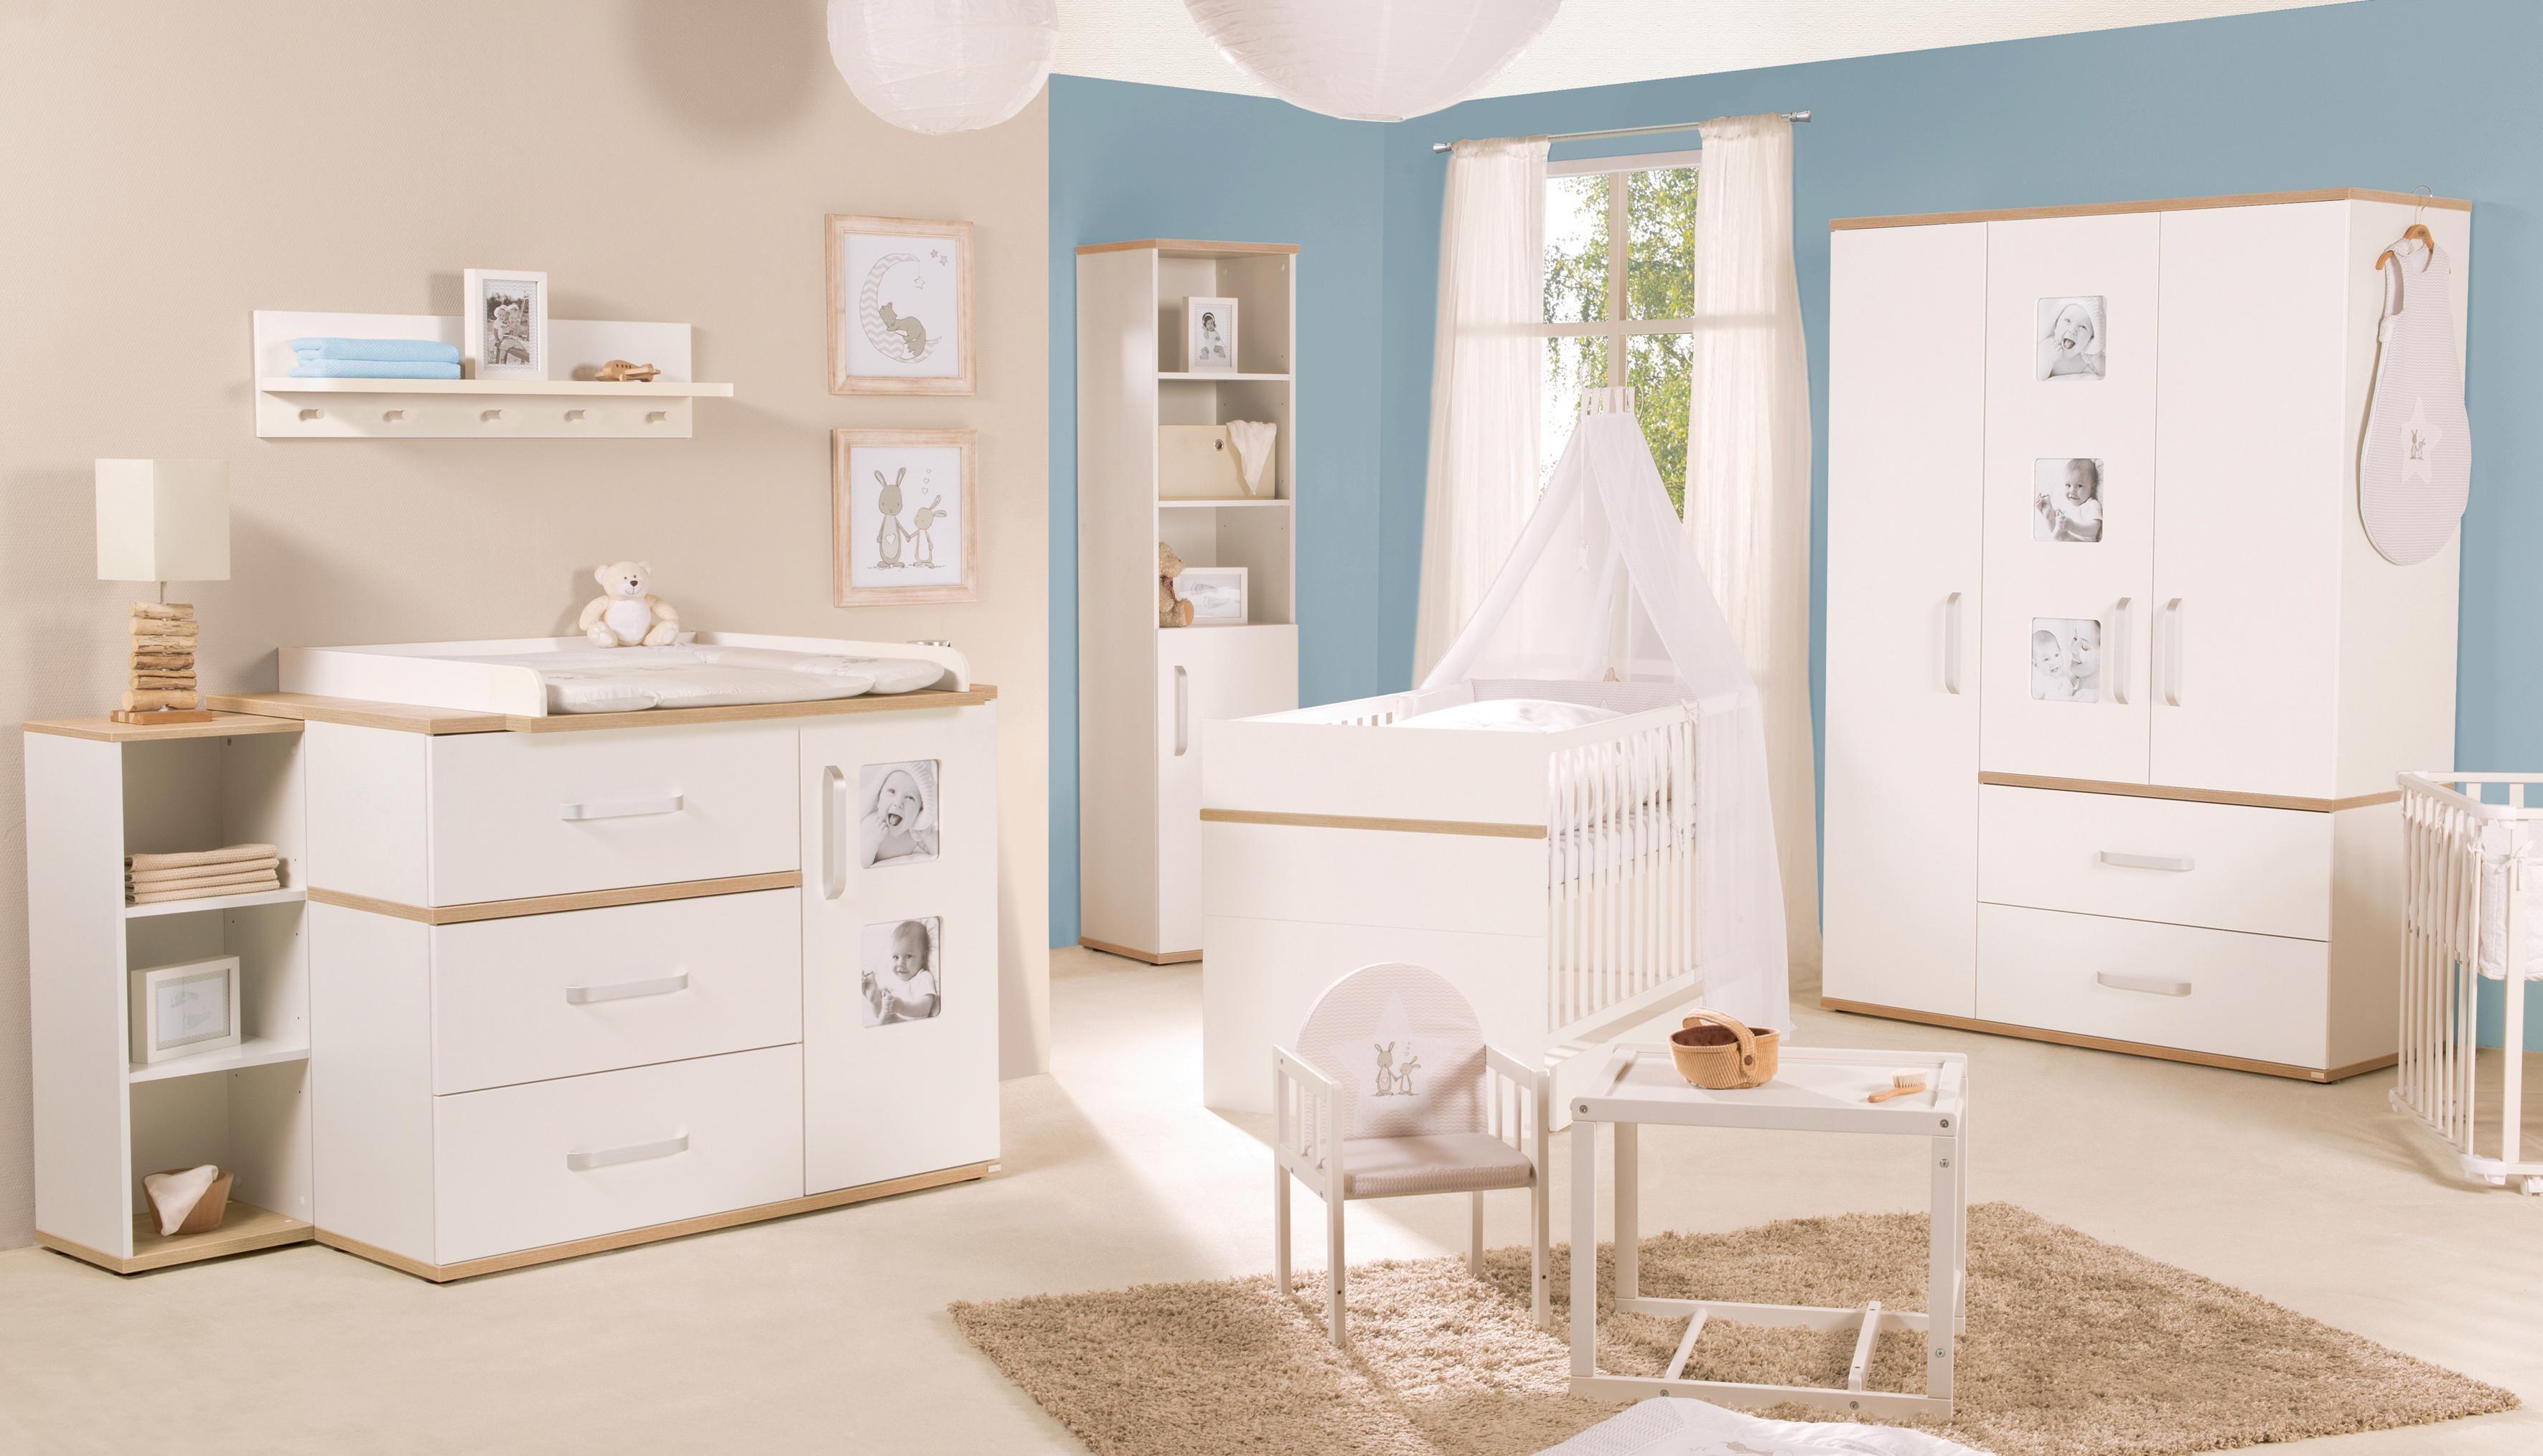 Roba Kinderzimmer Set (3-tlg.), »Pia breit« | Kinderzimmer > Komplett-Kinderzimmer | ROBA